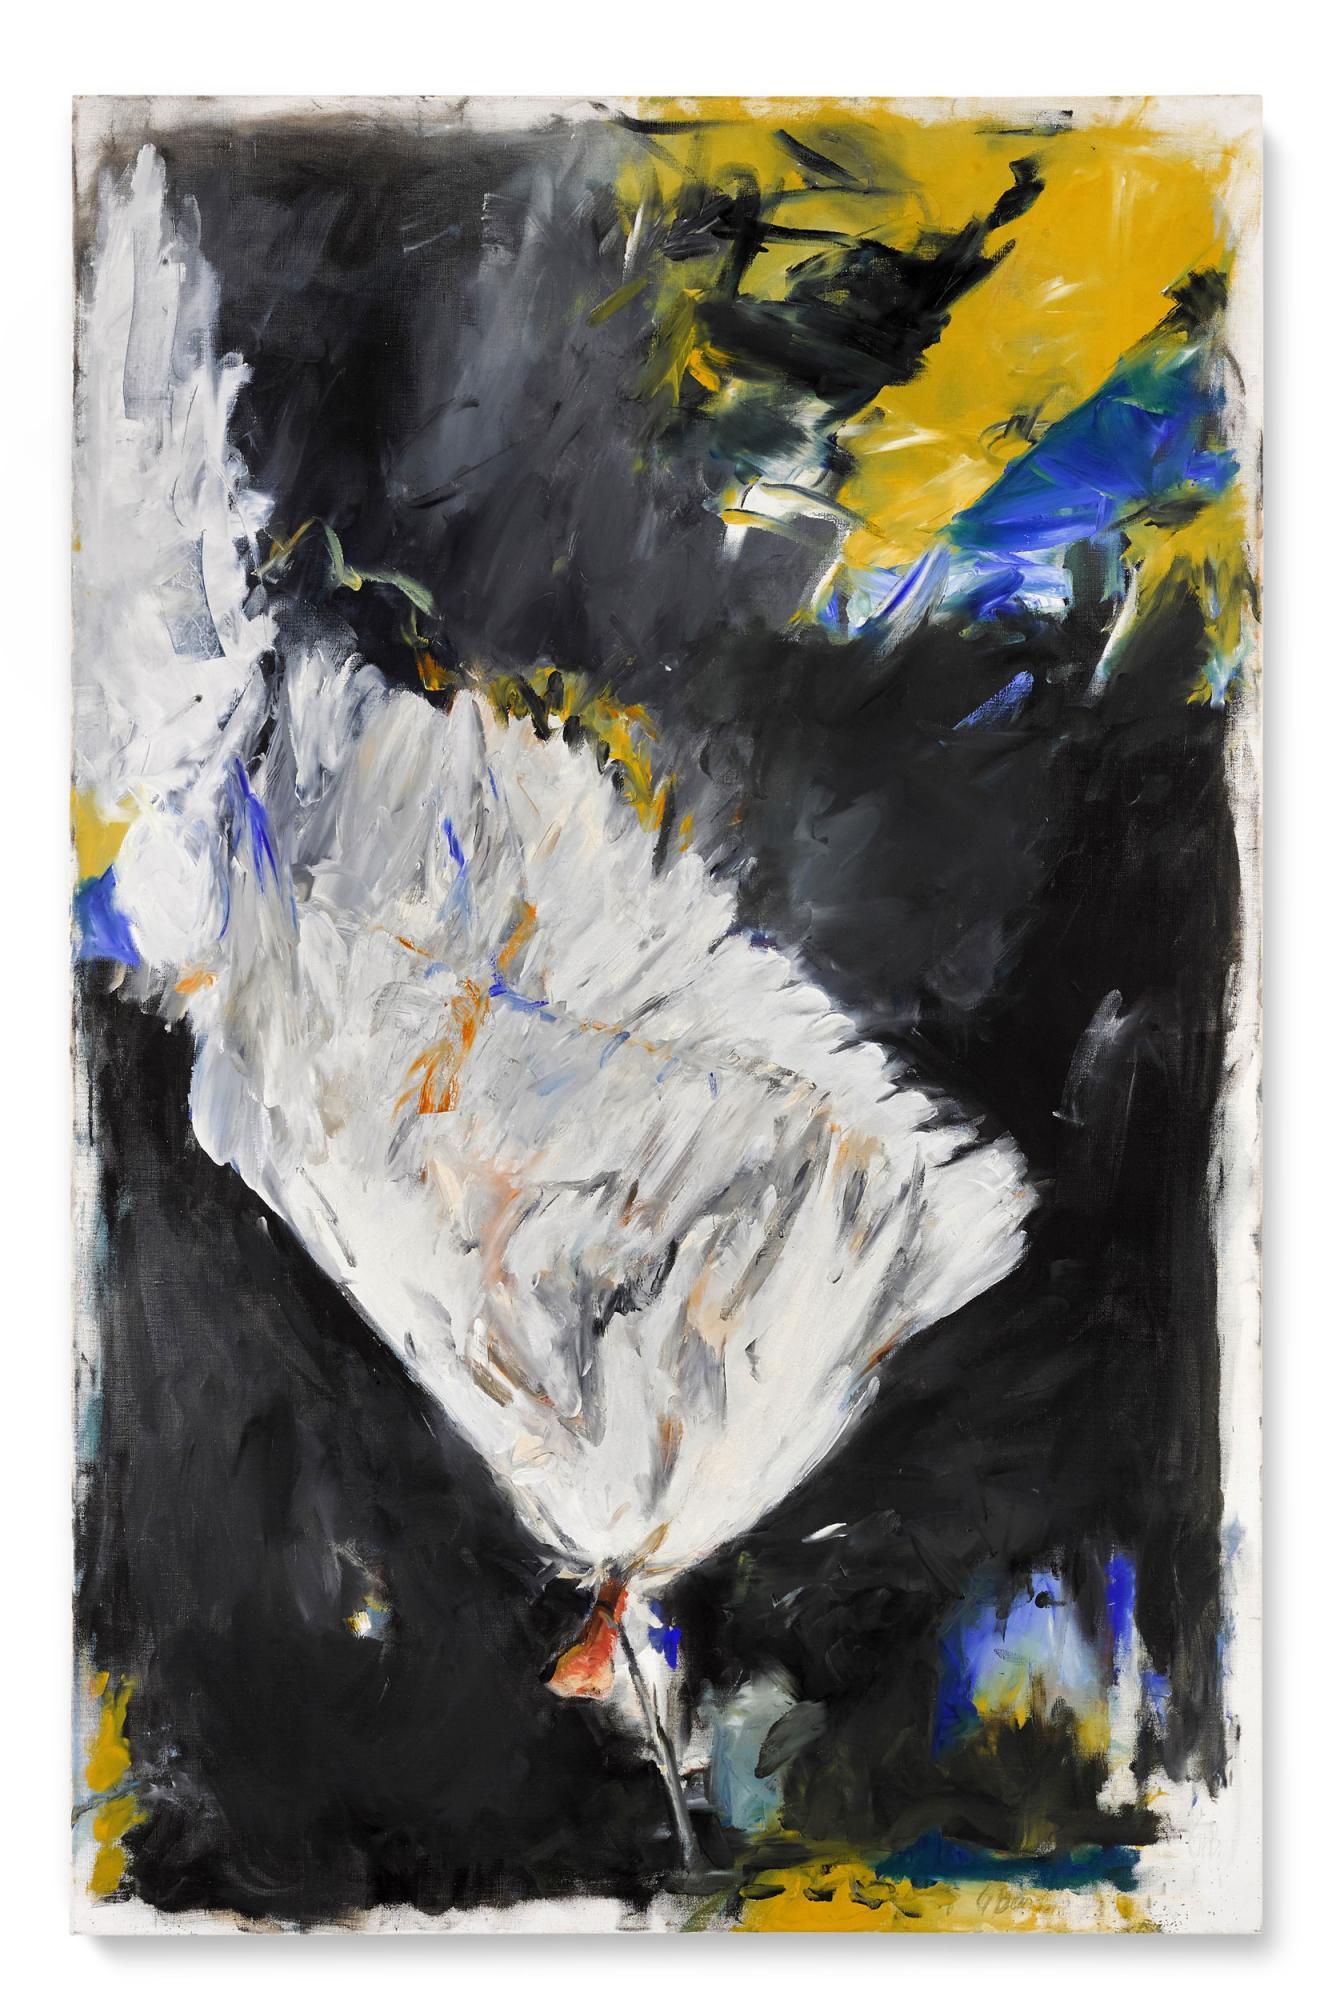 Lot-148,-George-Baselitz,-Fingermalerei---Flügel-(Finger-Painting---Wing),-est.jpg